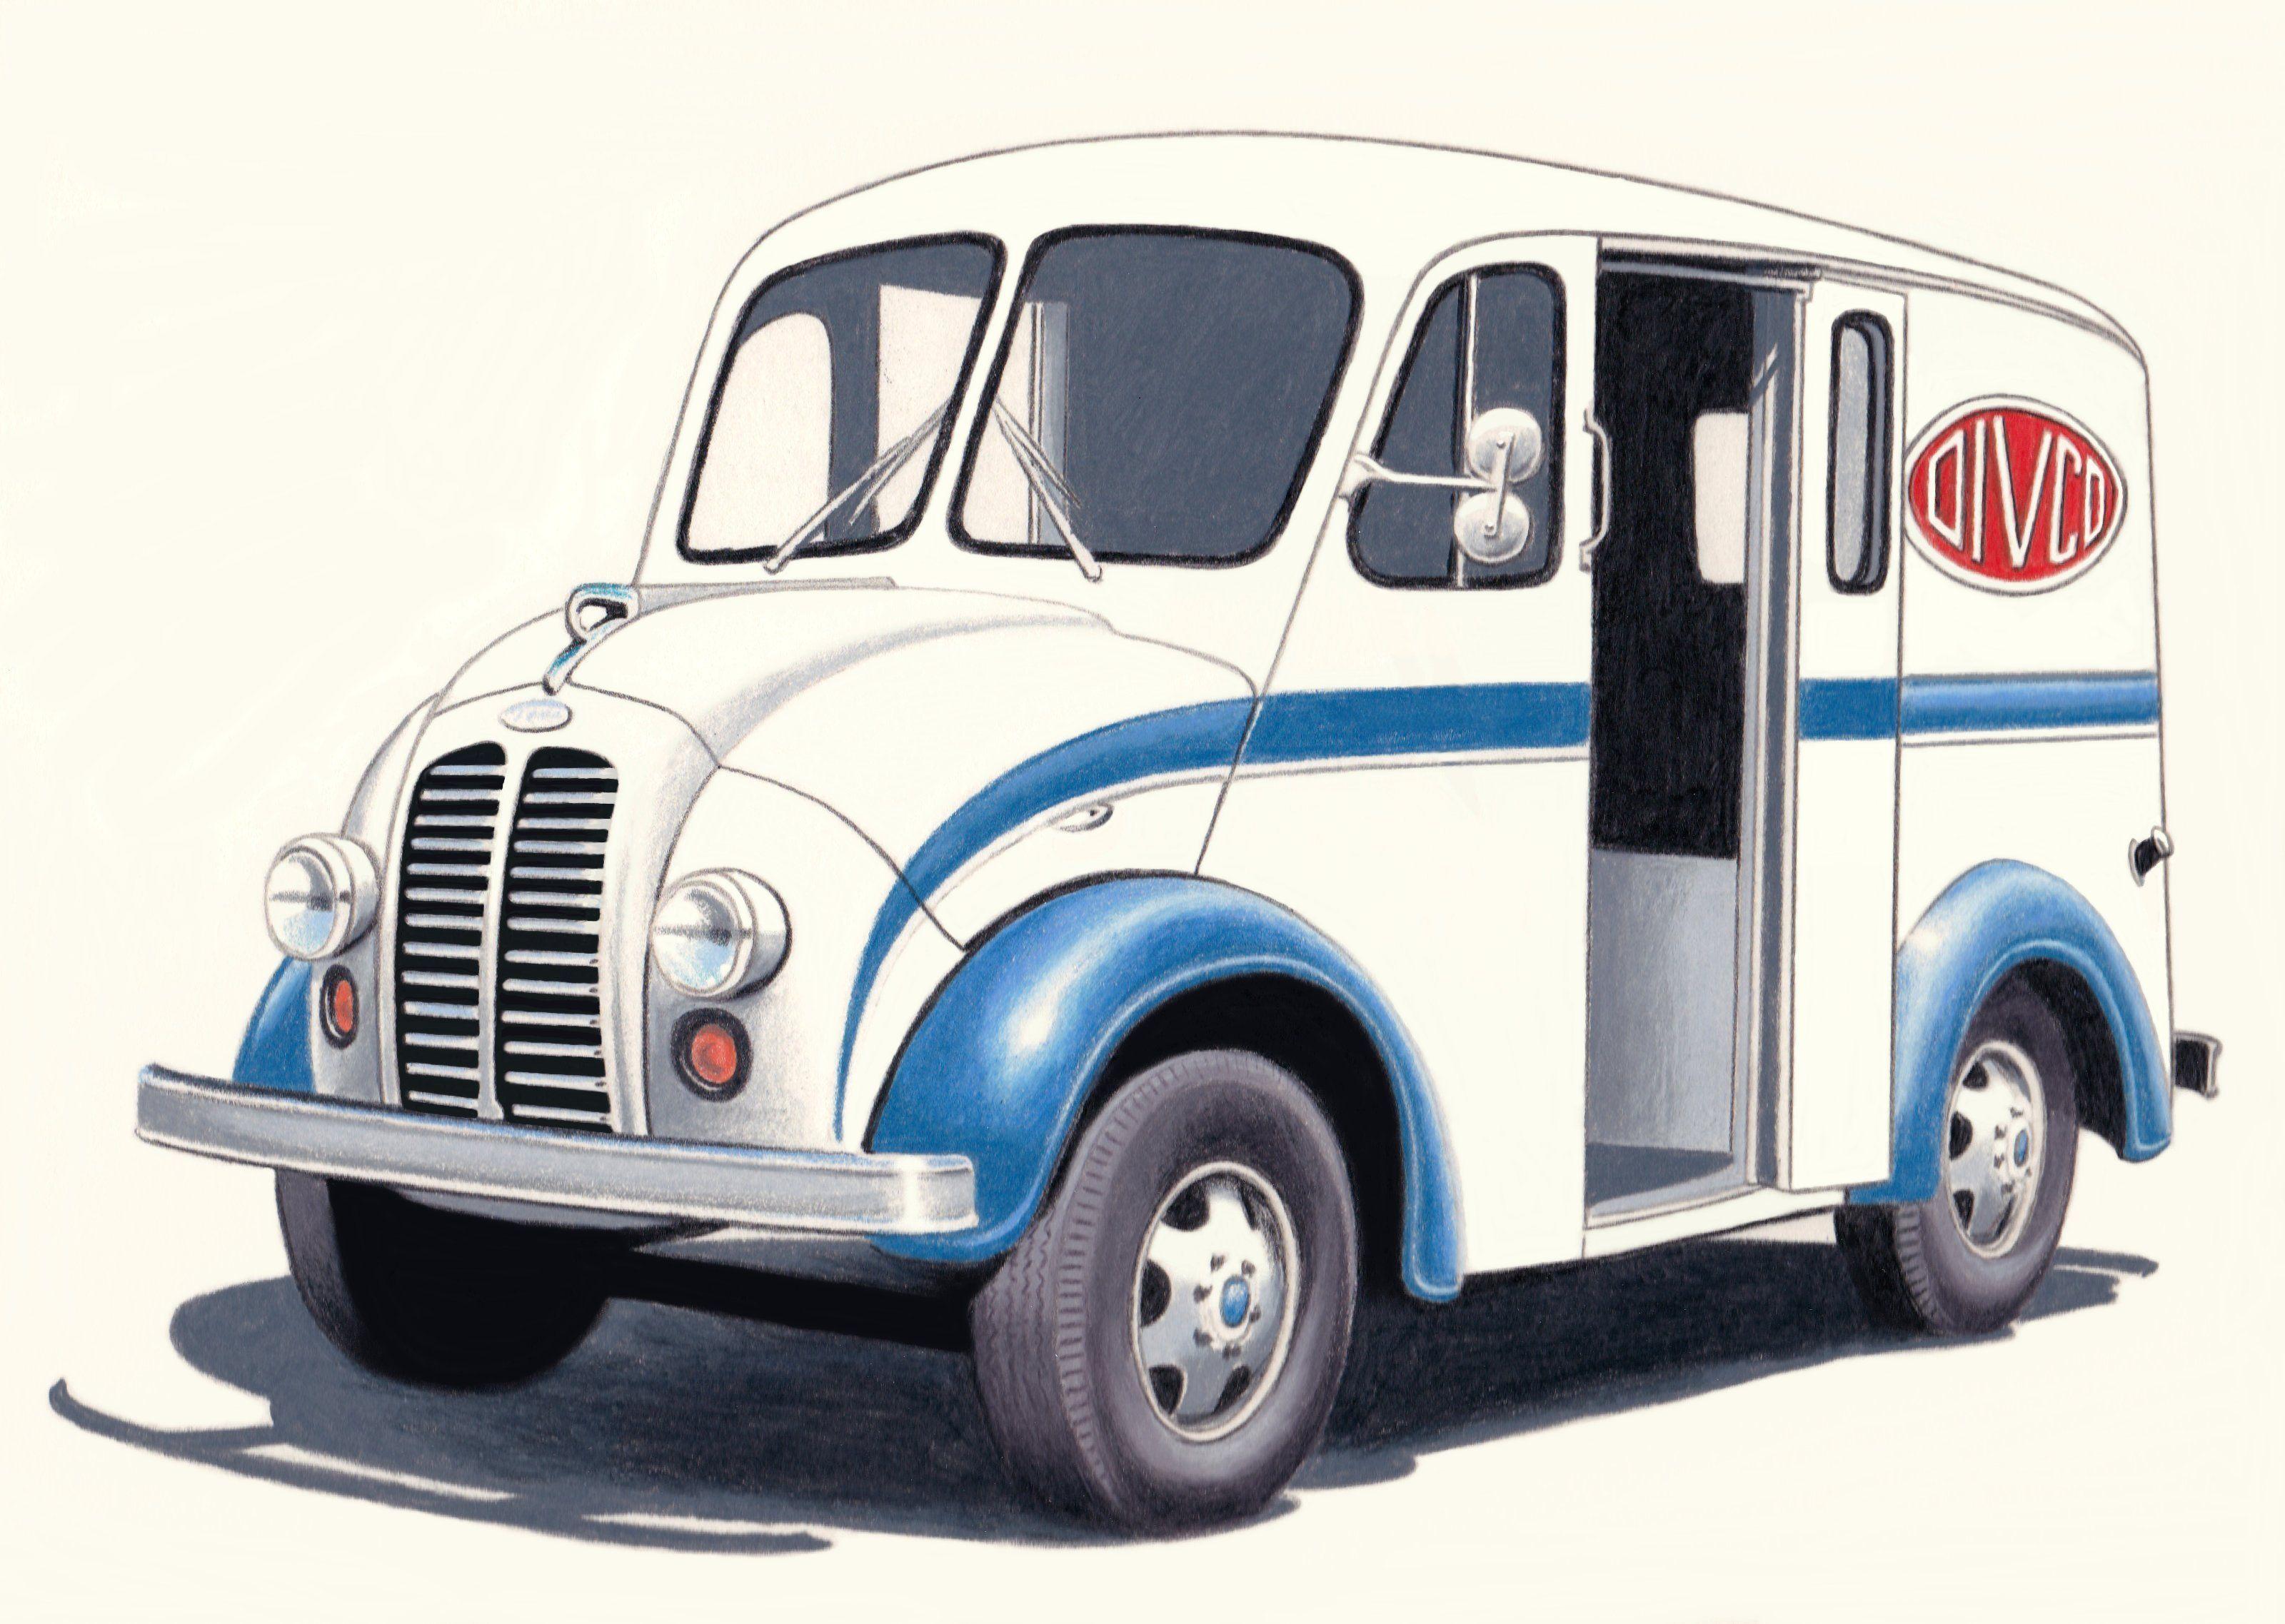 Ford Coe For Sale Craigslist Google Da Ara Classic